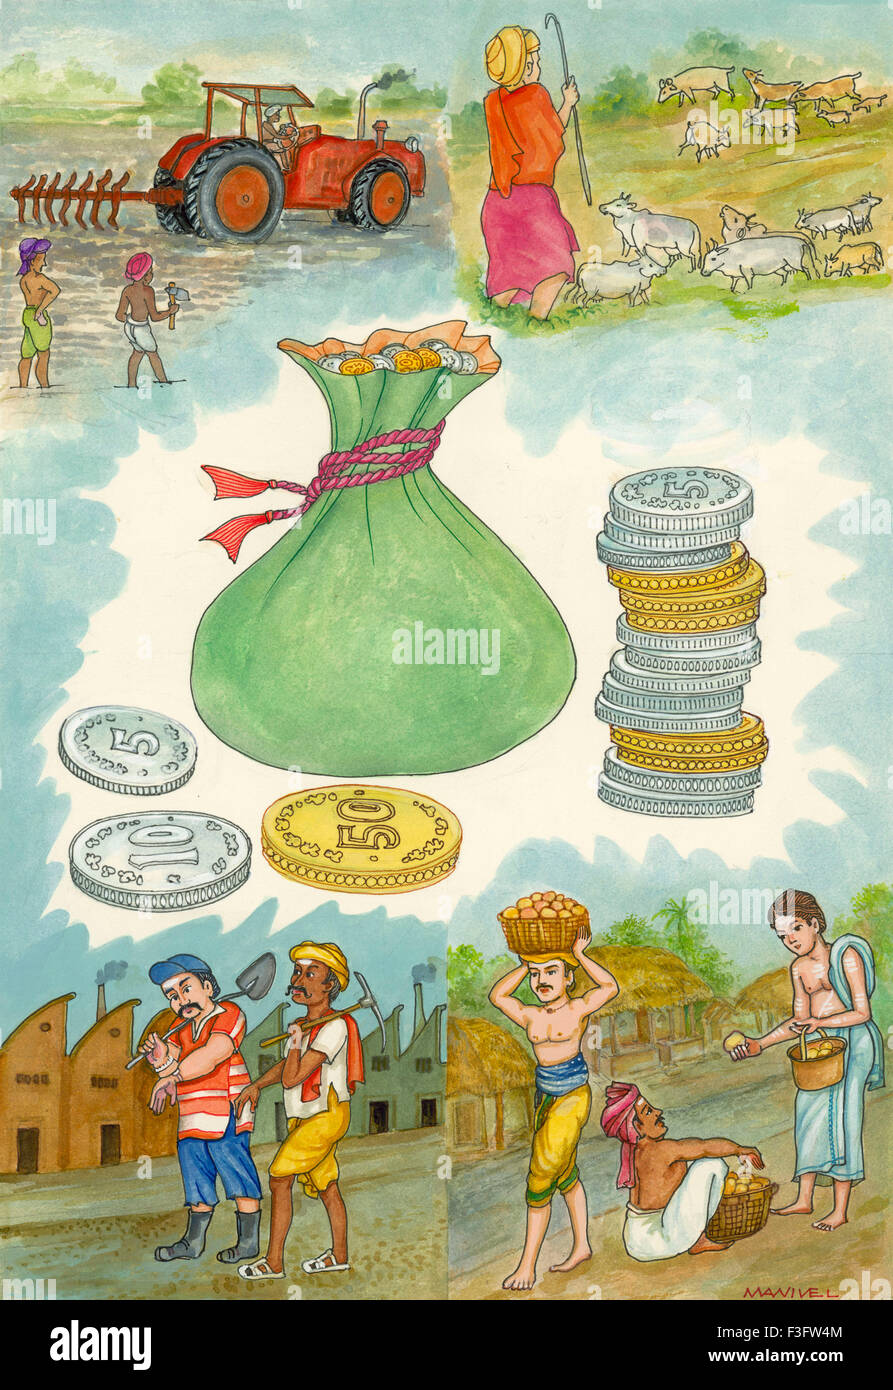 Artist Manivelu Hindu Belief Hindu Stock Photos & Artist Manivelu ...